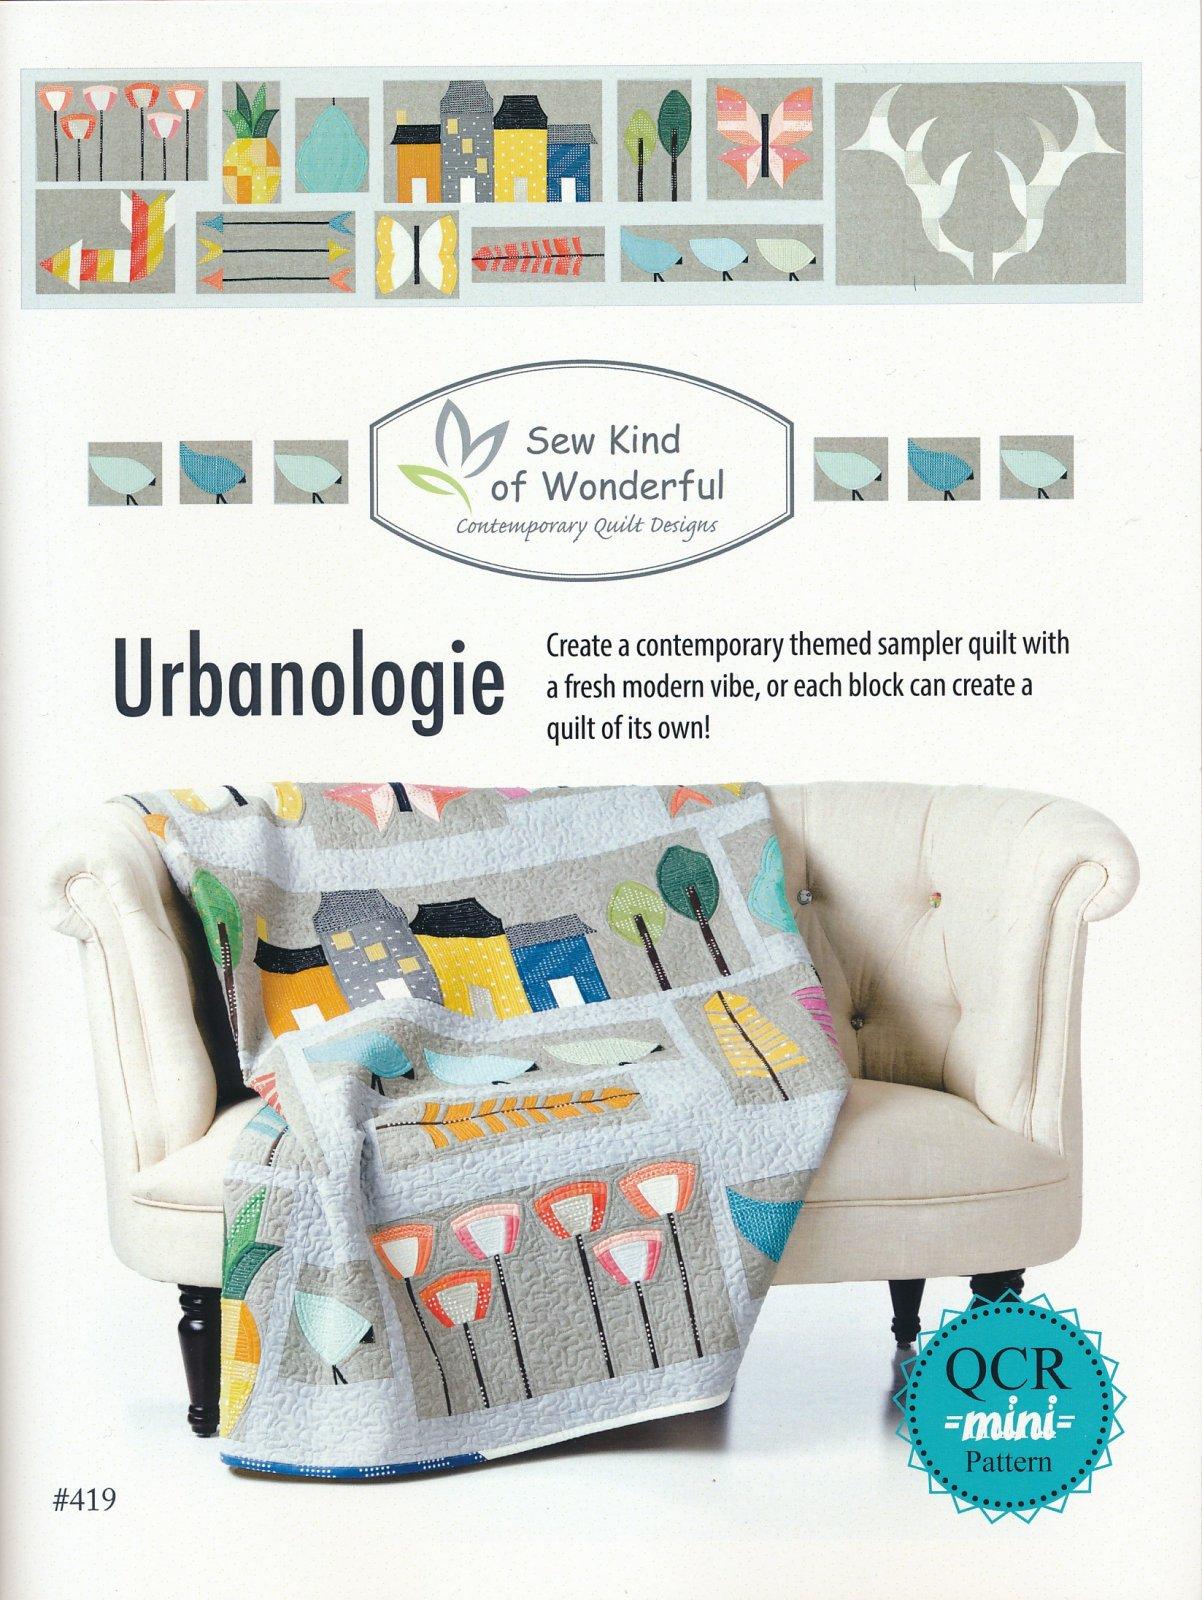 Urbanologie - Contemporary Quilt Designs